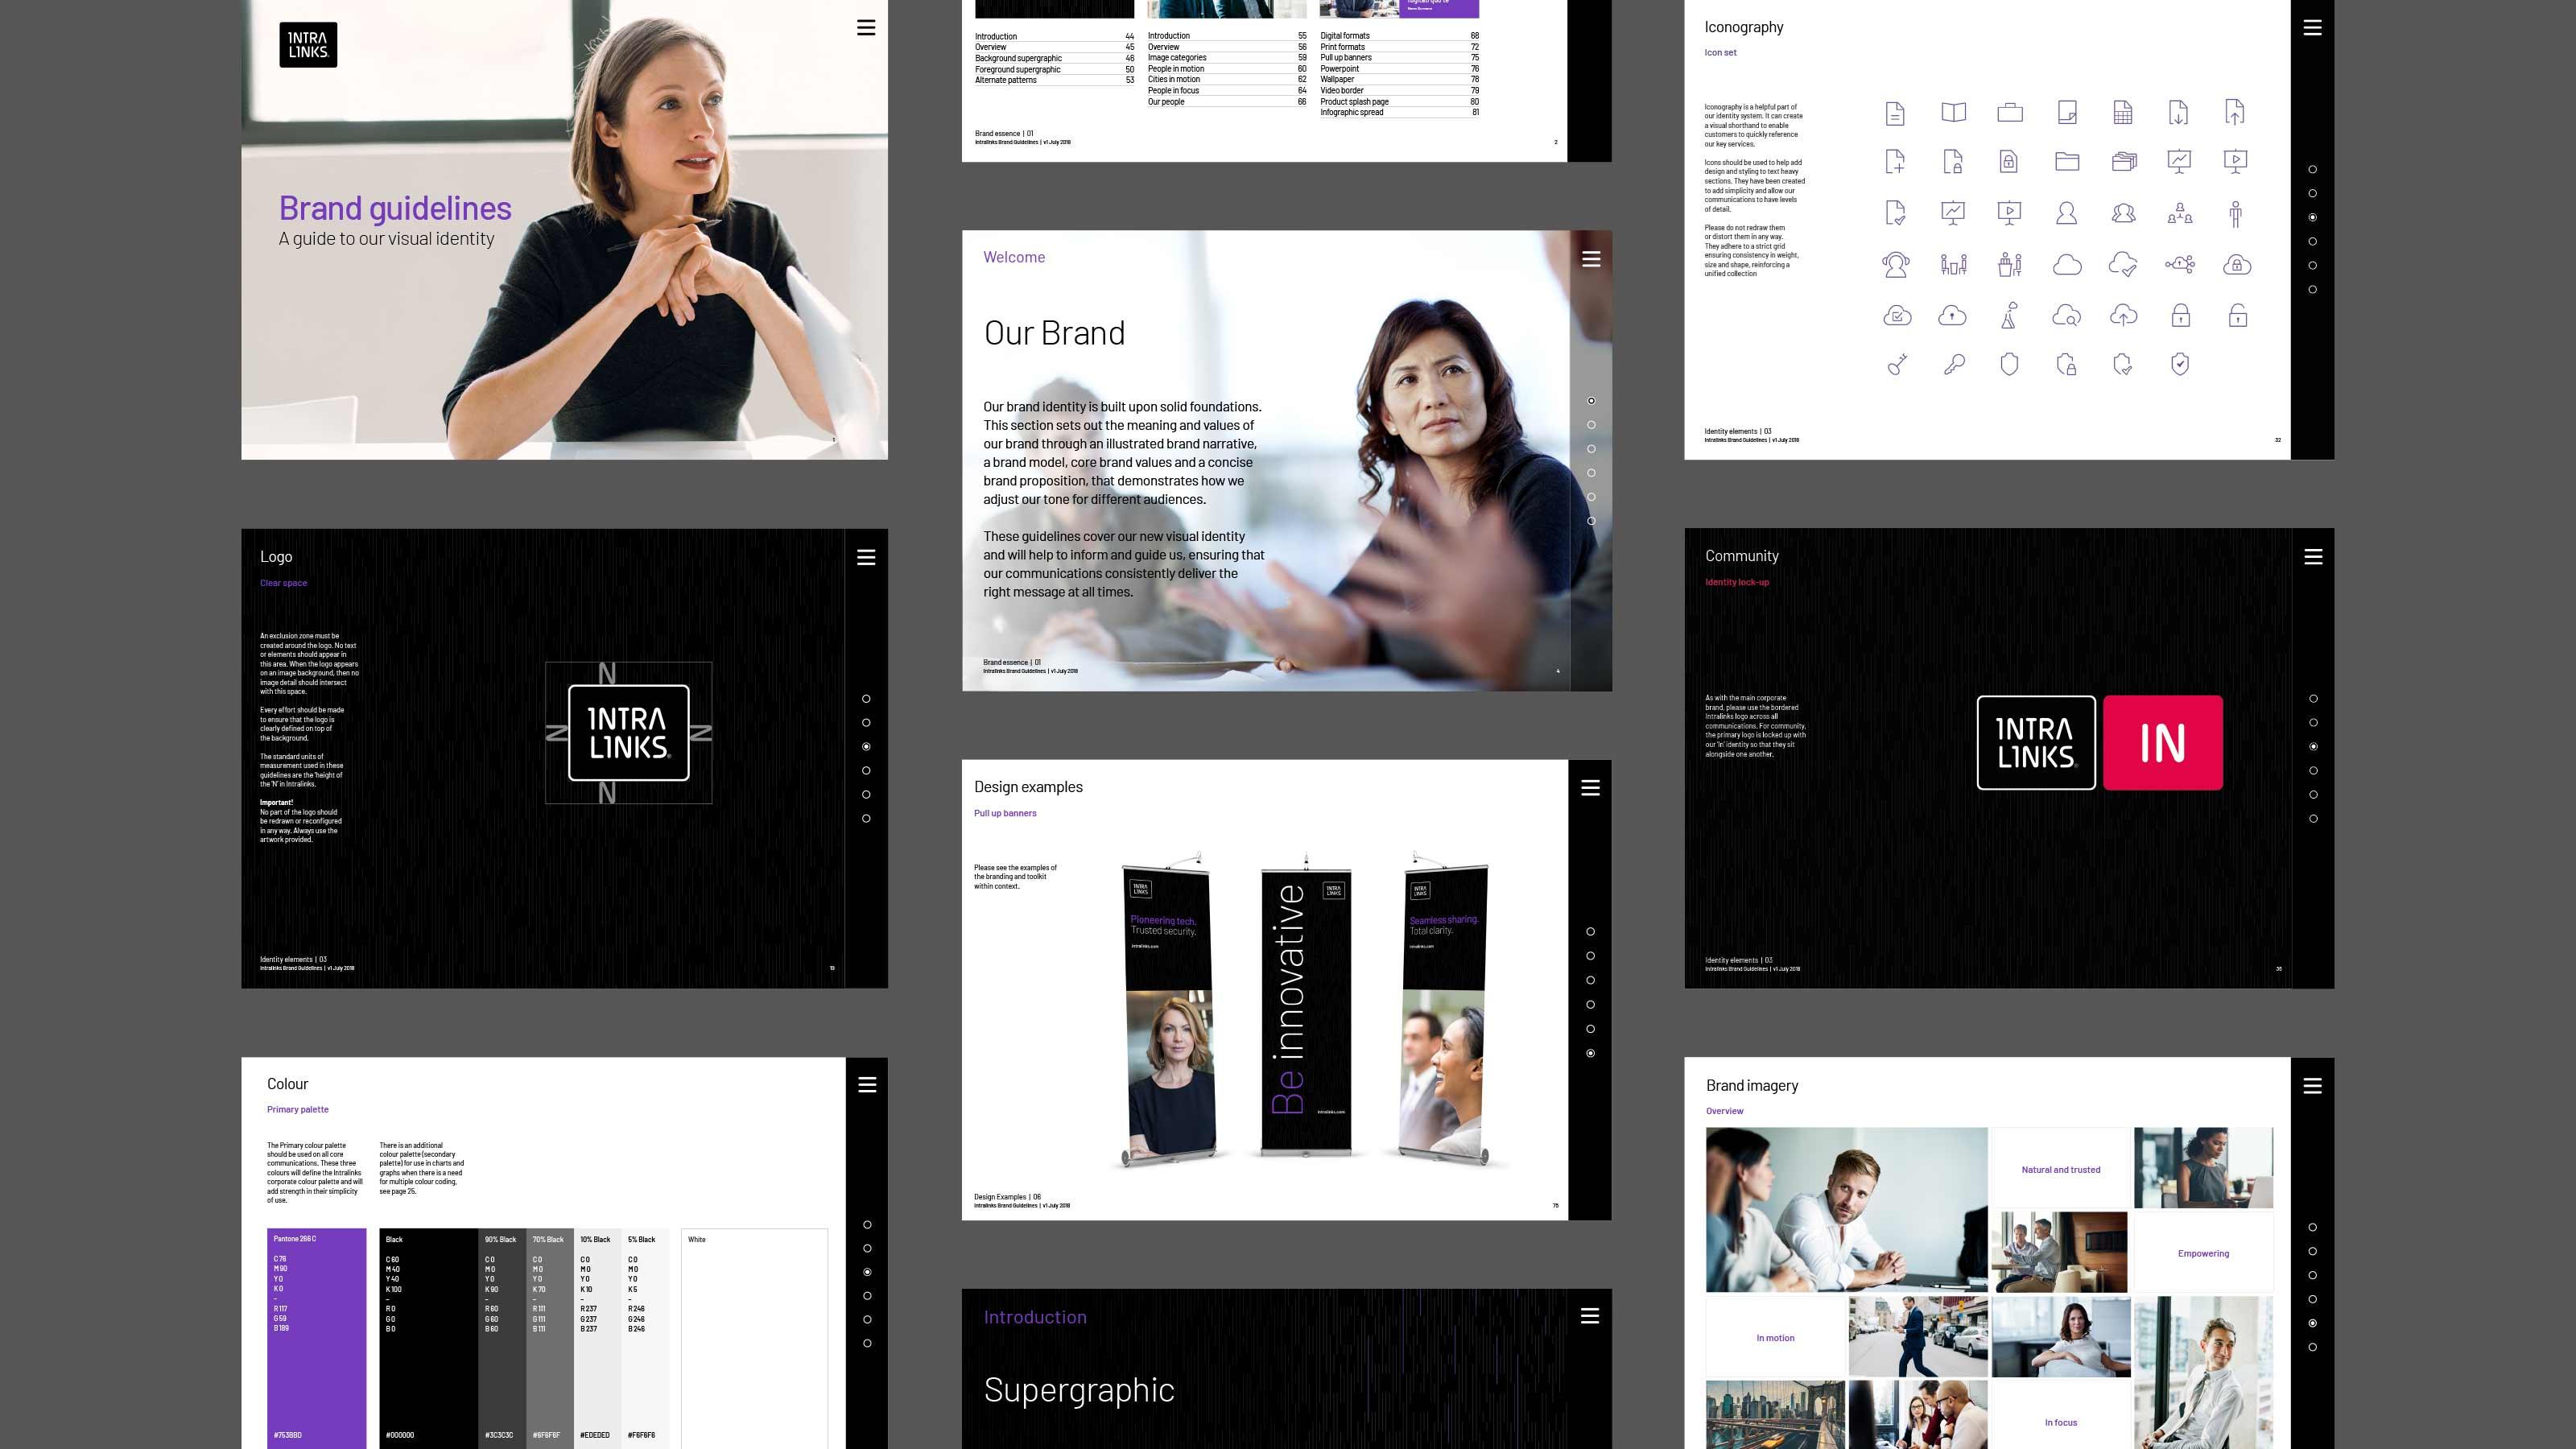 Intralinks_Brand_design_layout_screens